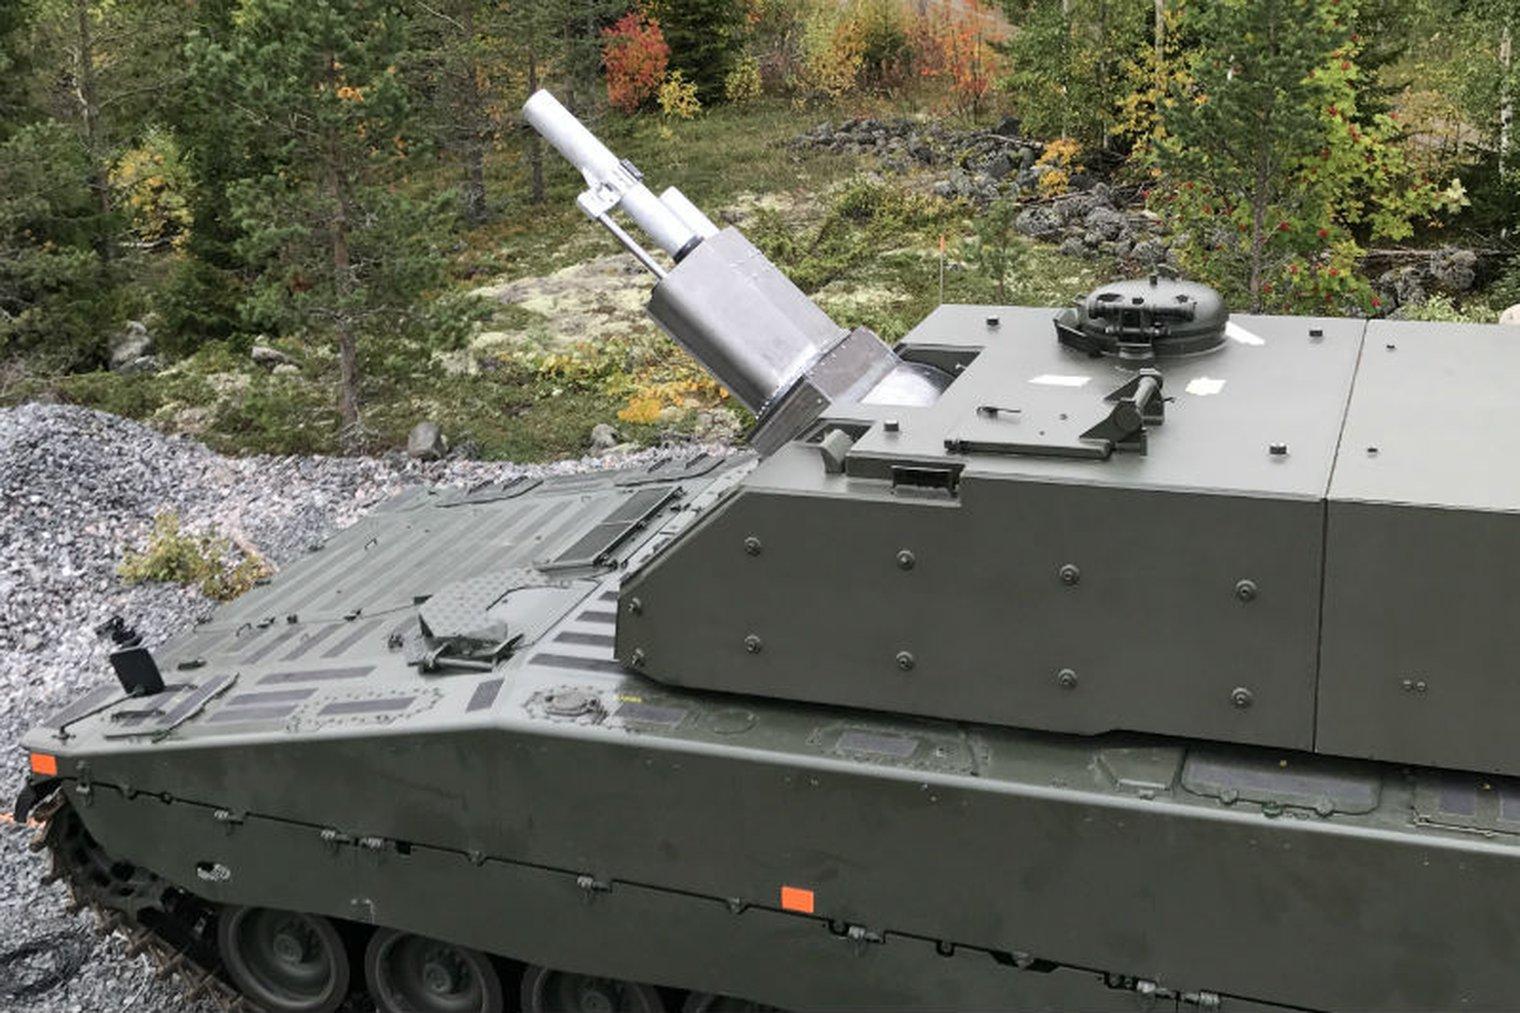 Swedish CV90 begins 120mm mortar firing trials - LWI - Land